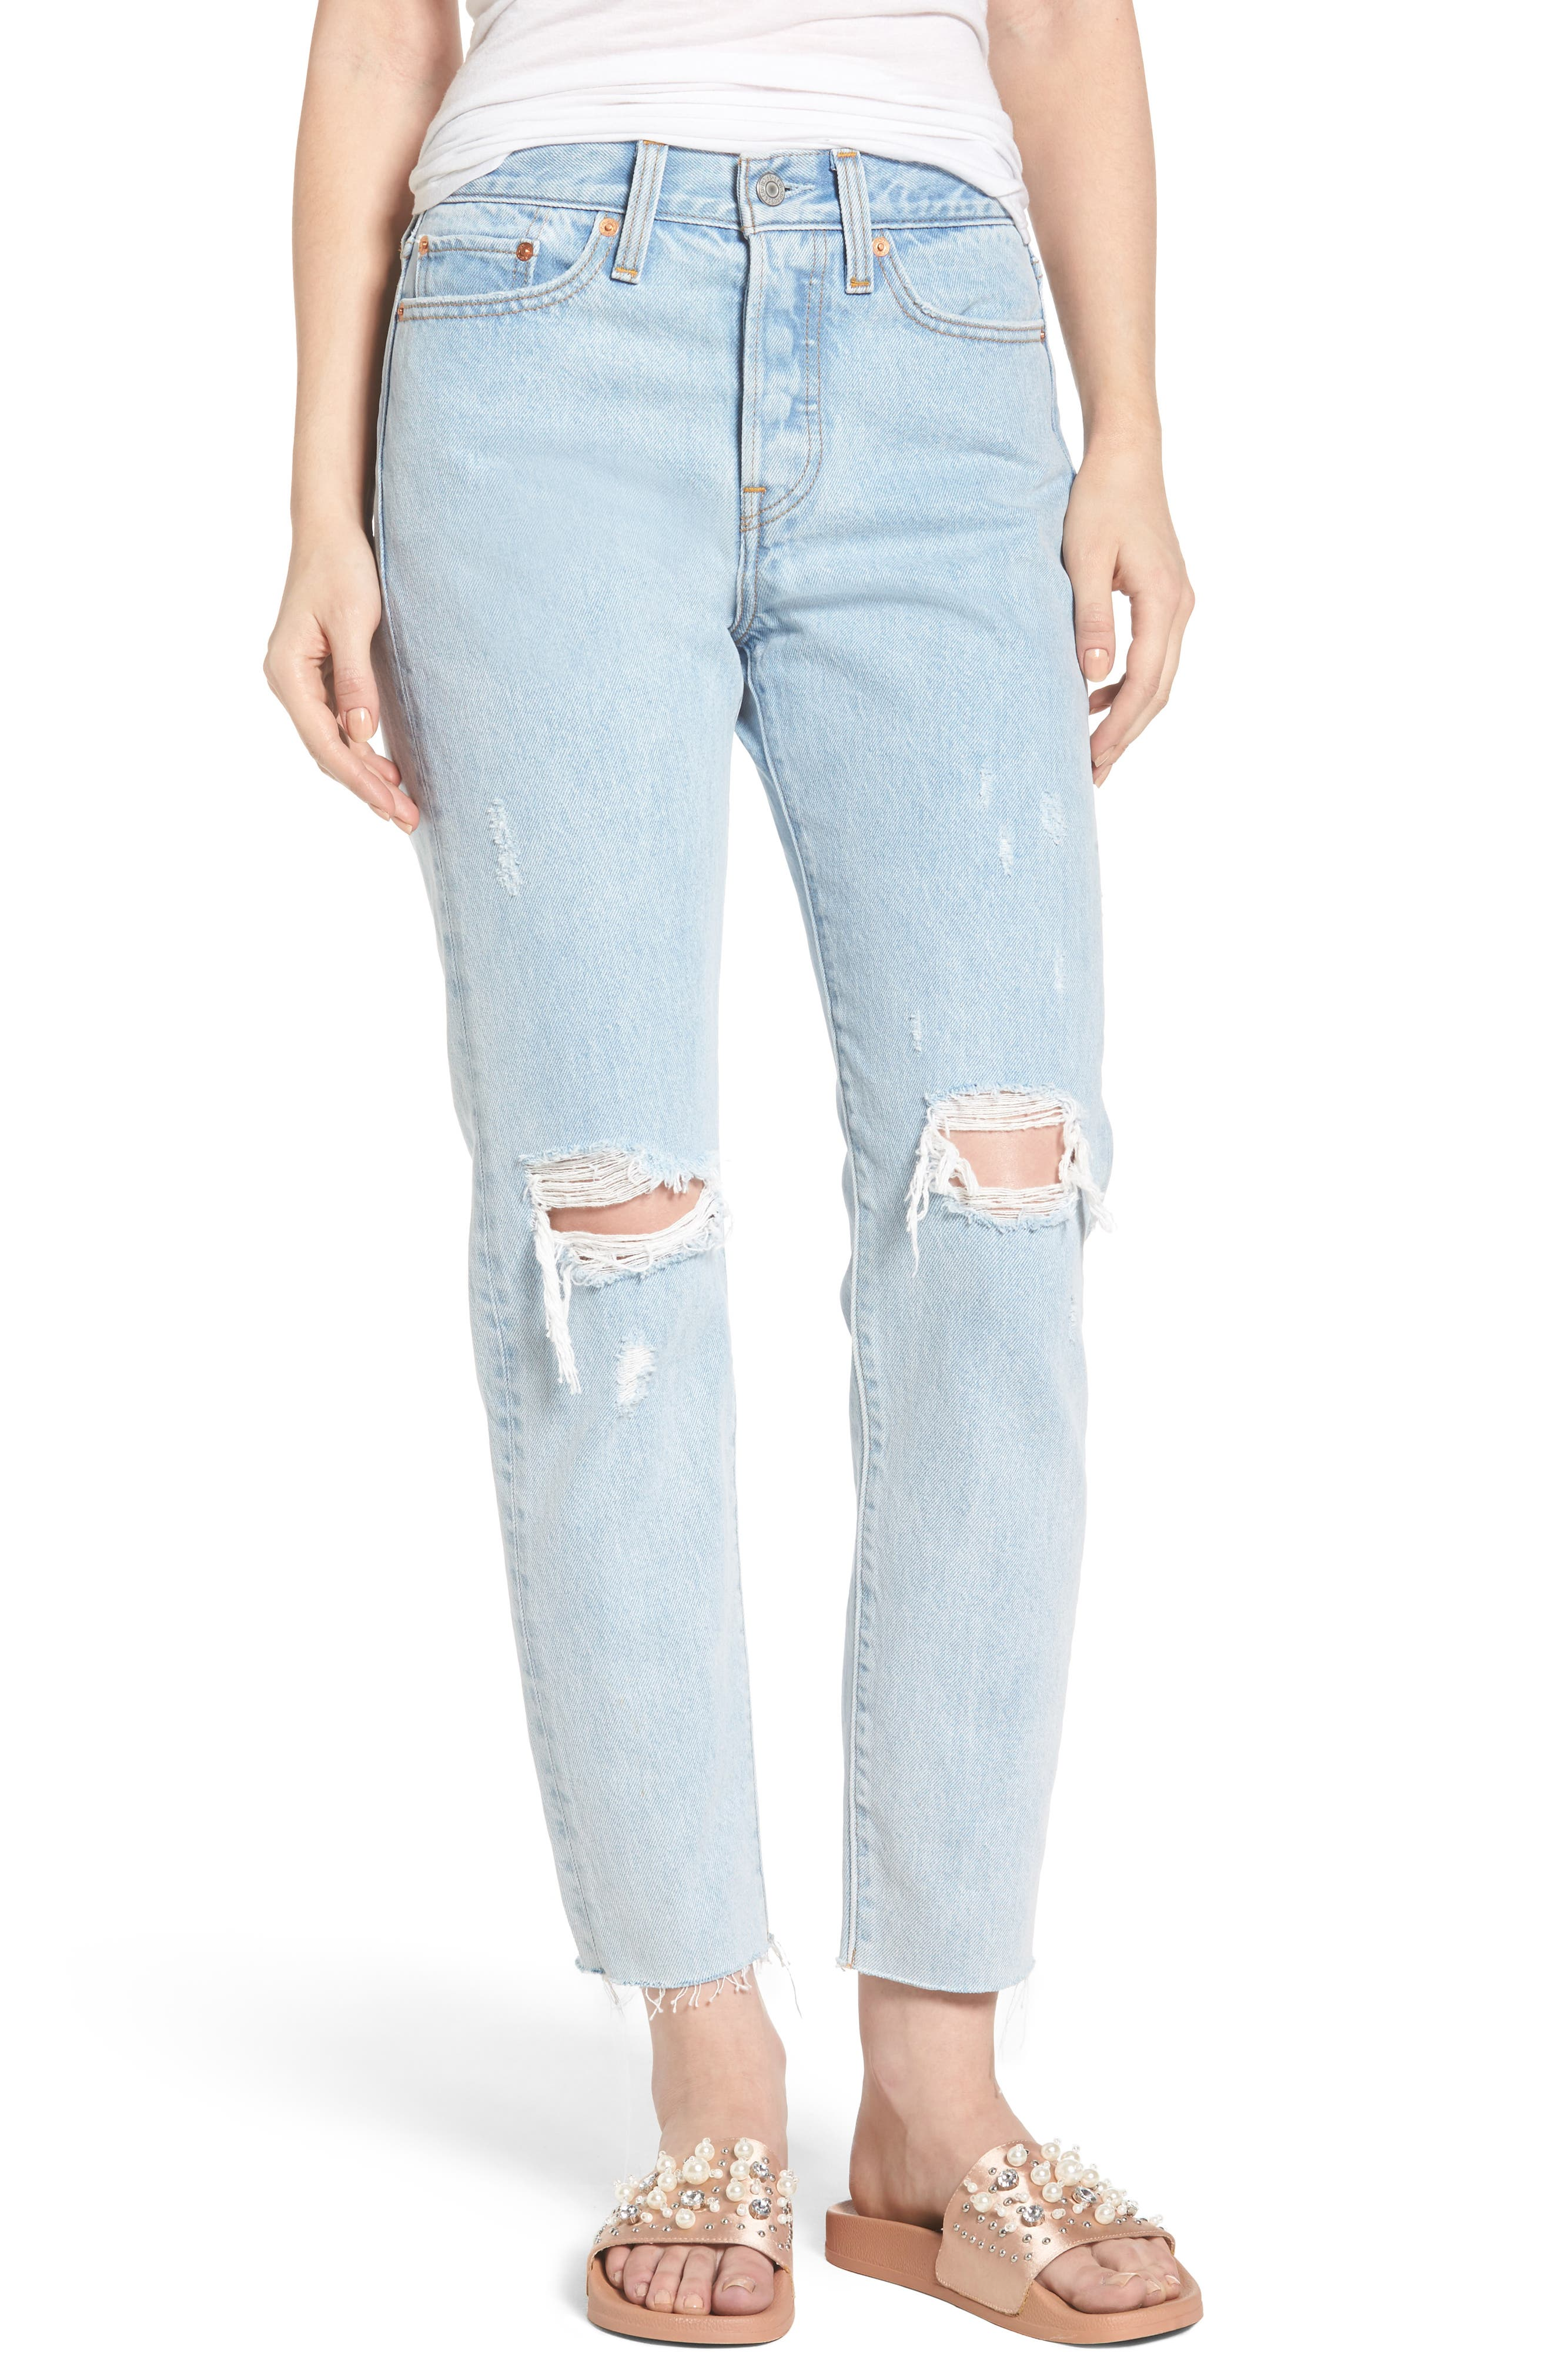 Wedgie High Waist Crop Jeans,                             Main thumbnail 1, color,                             450